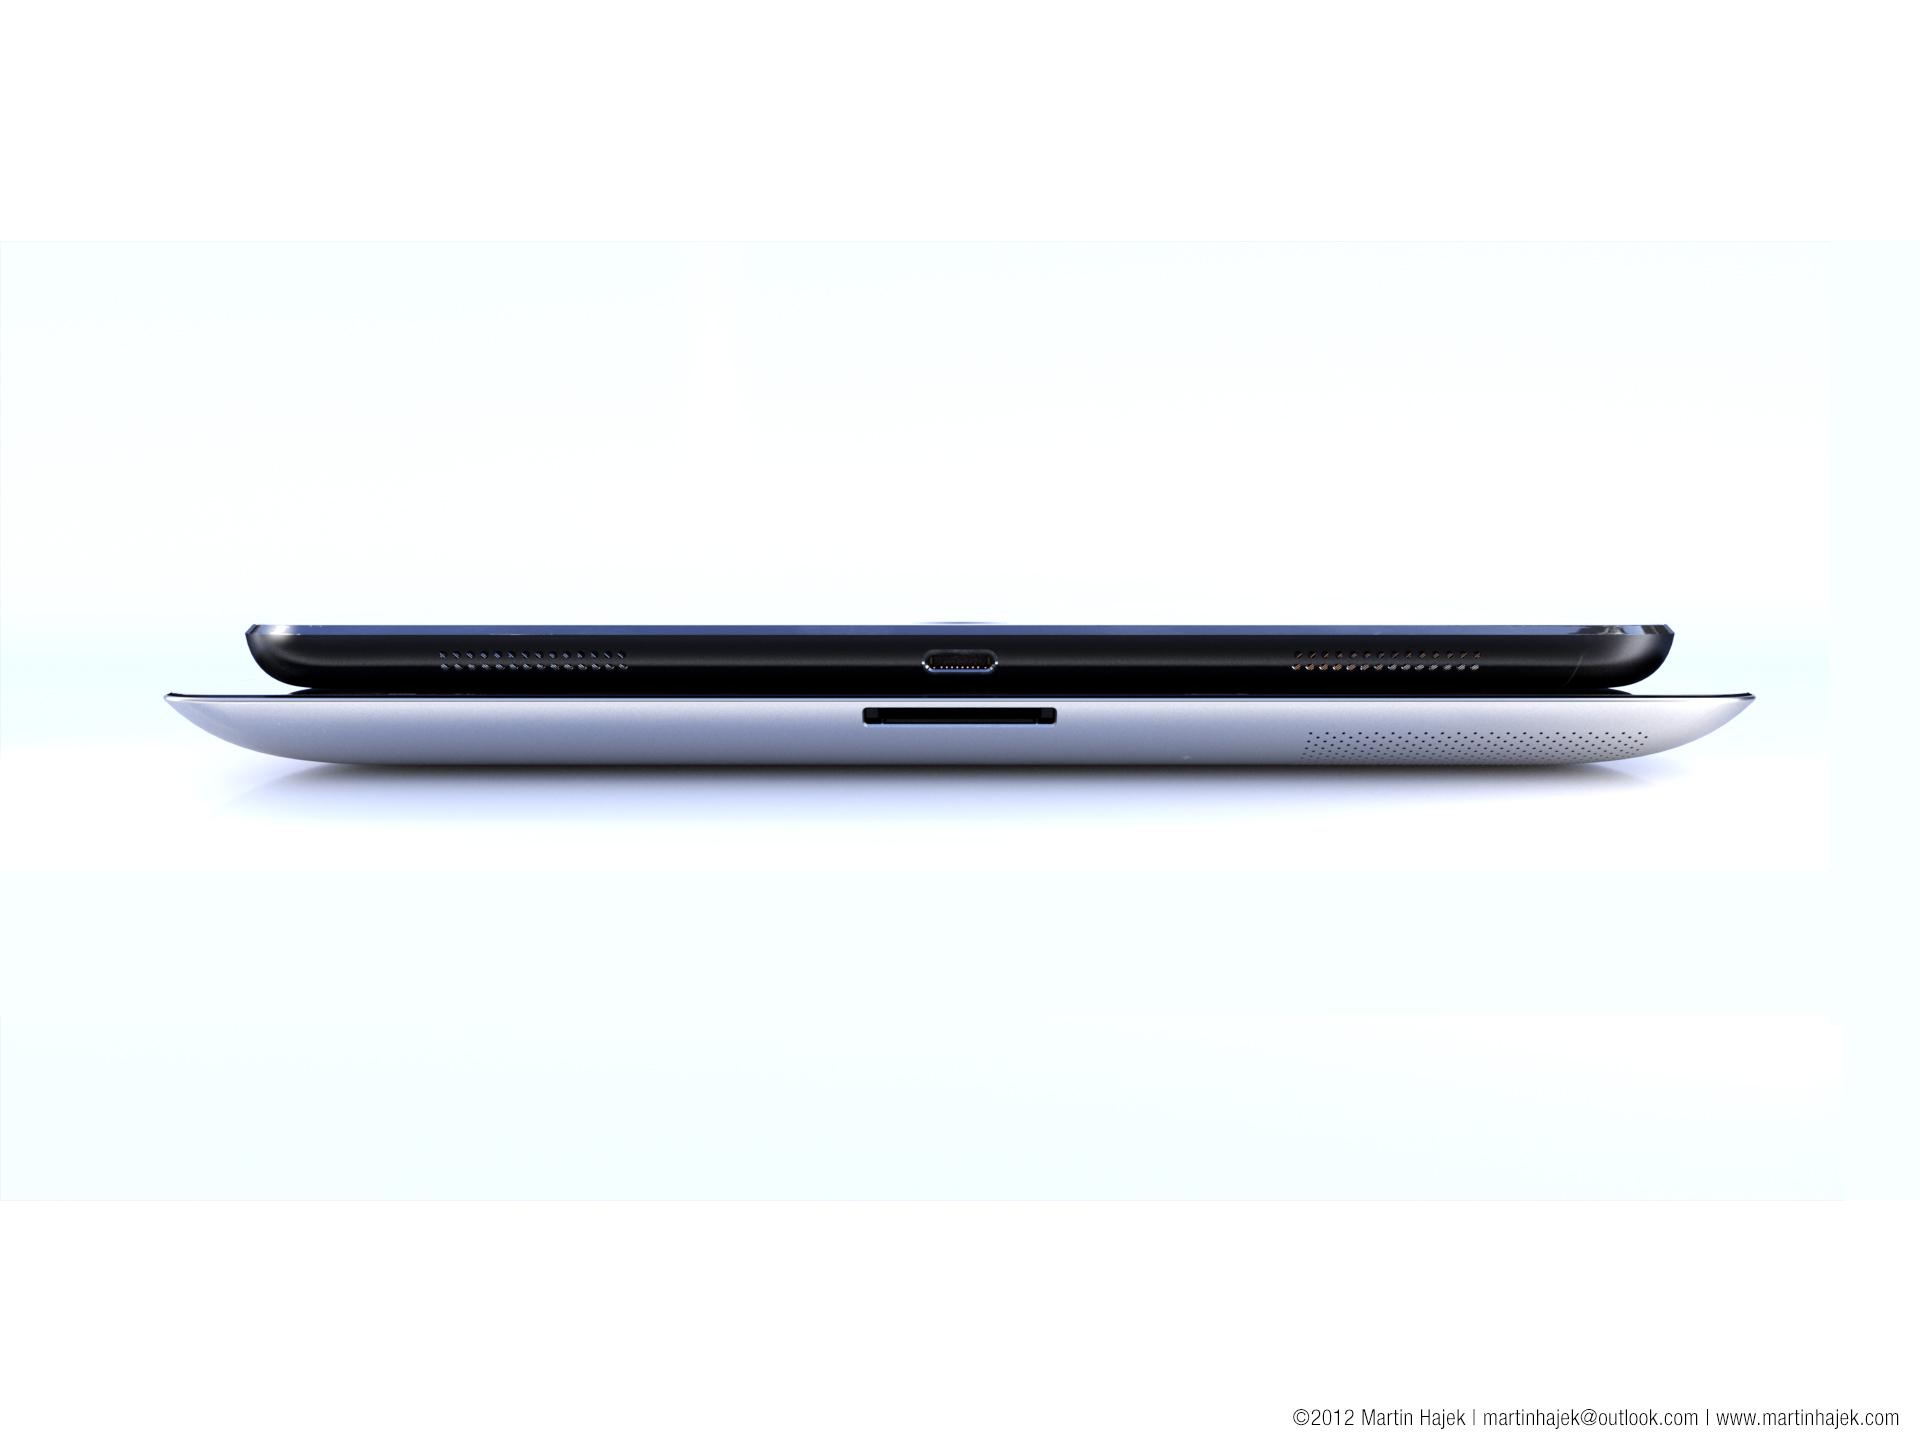 iPad5-mockup-render-03